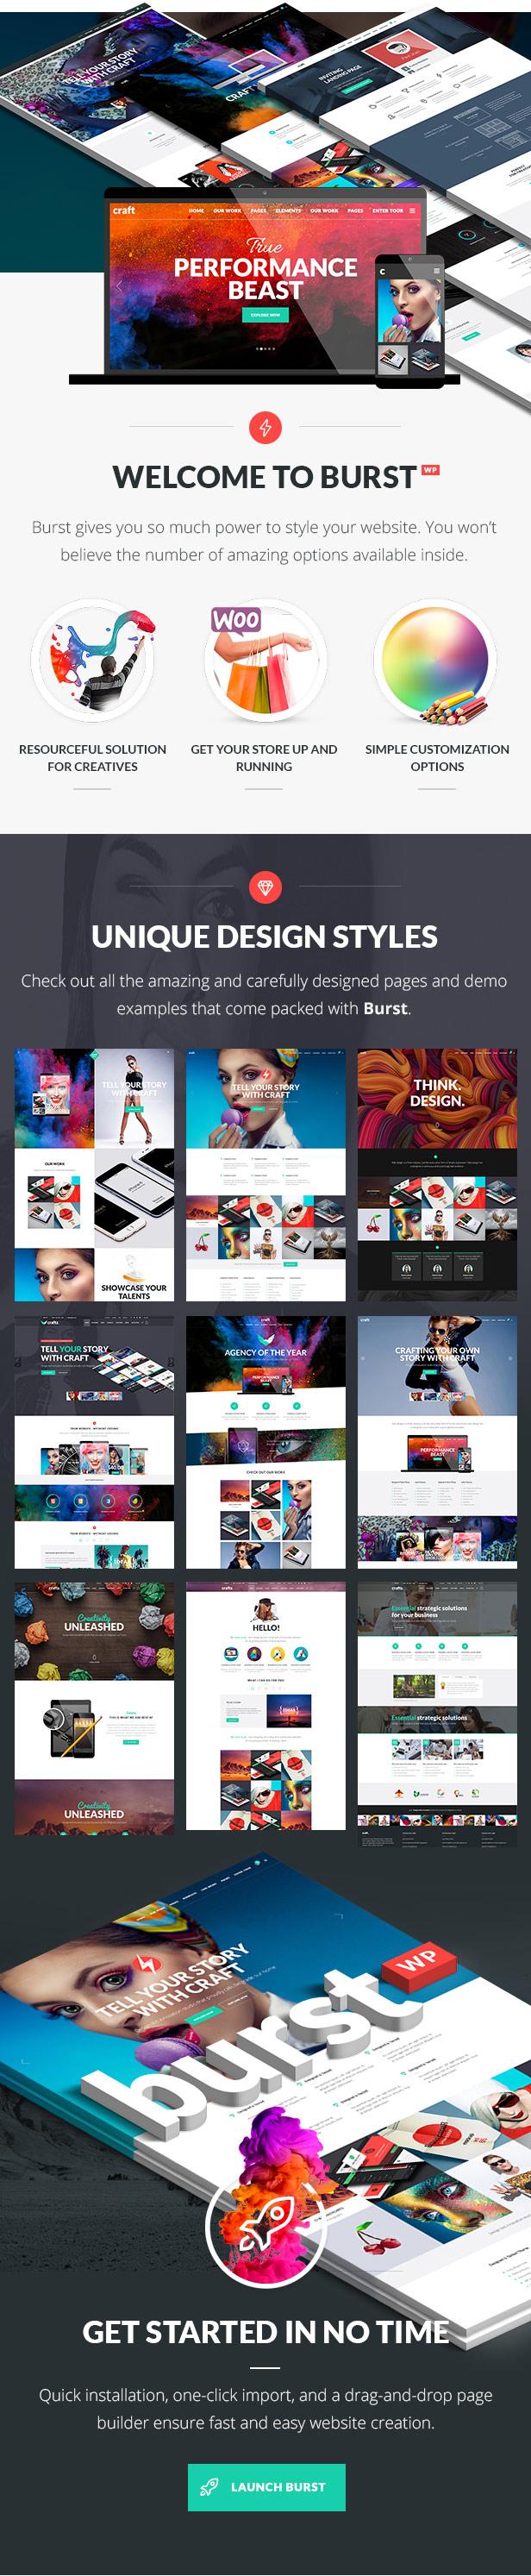 Burst - Creative Design Agency - 1